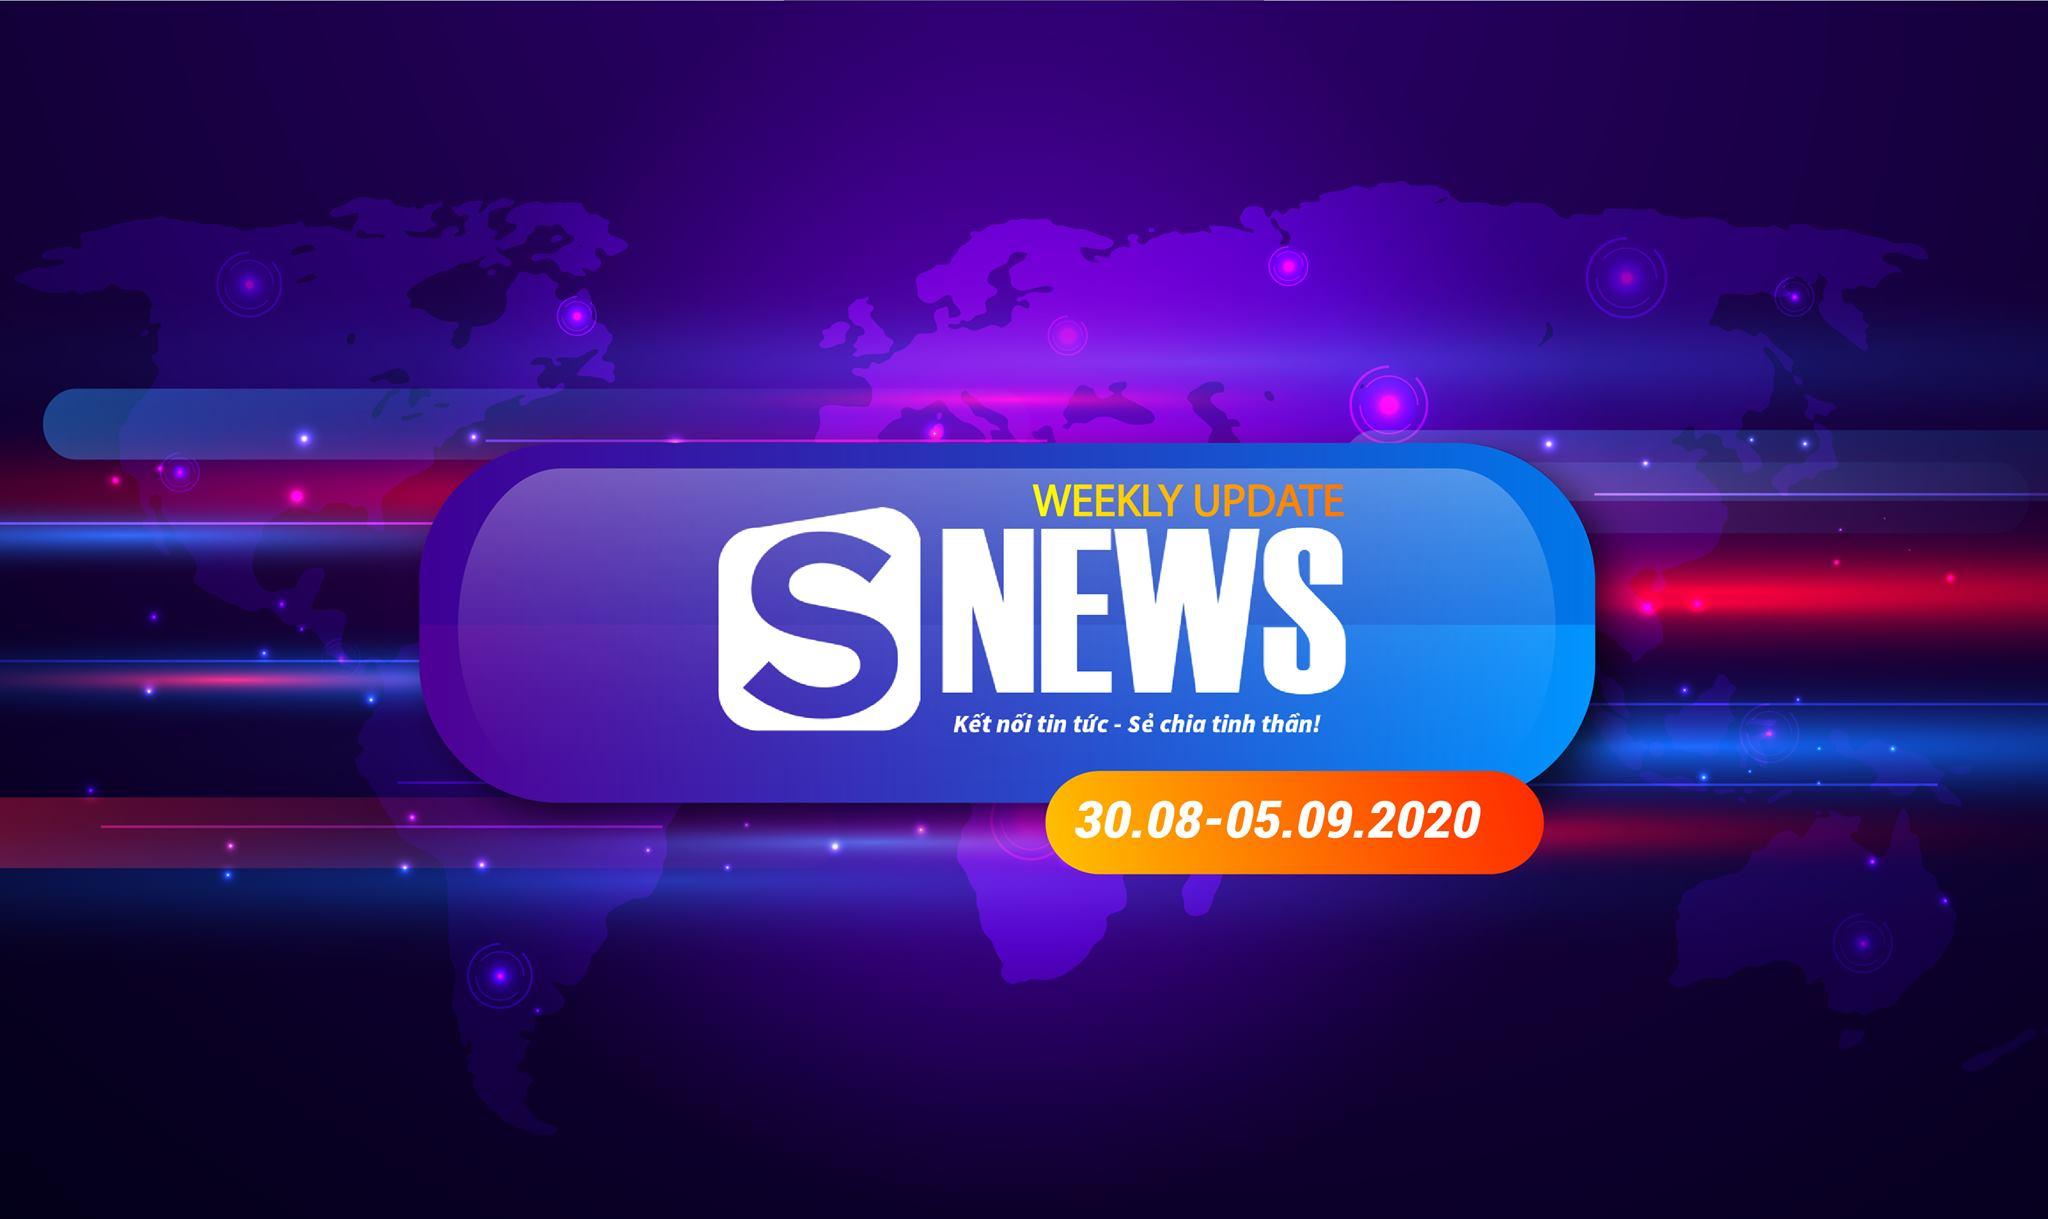 Tổng hợp tin tức Sapo tuần qua: 31.08 - 05.09